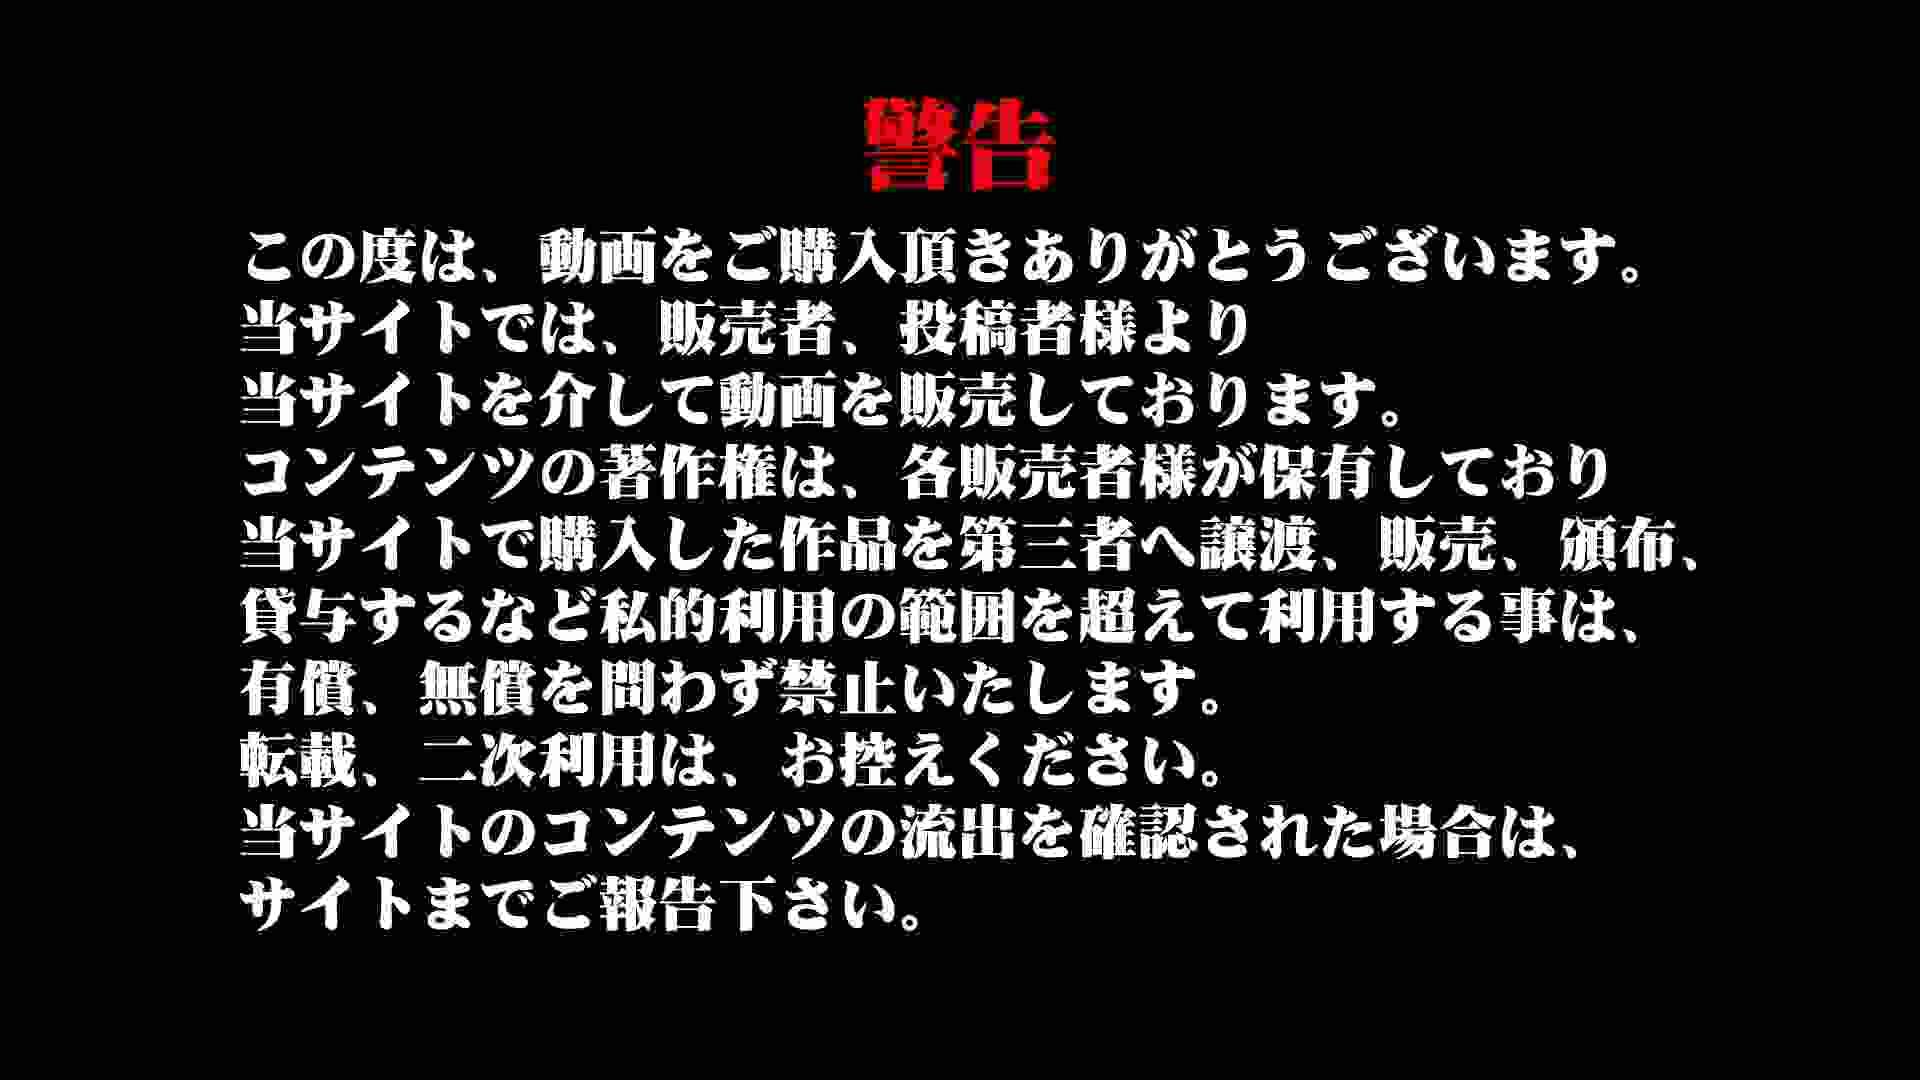 Aquaな露天風呂Vol.927 盗撮特撮 オマンコ無修正動画無料 12pic 2